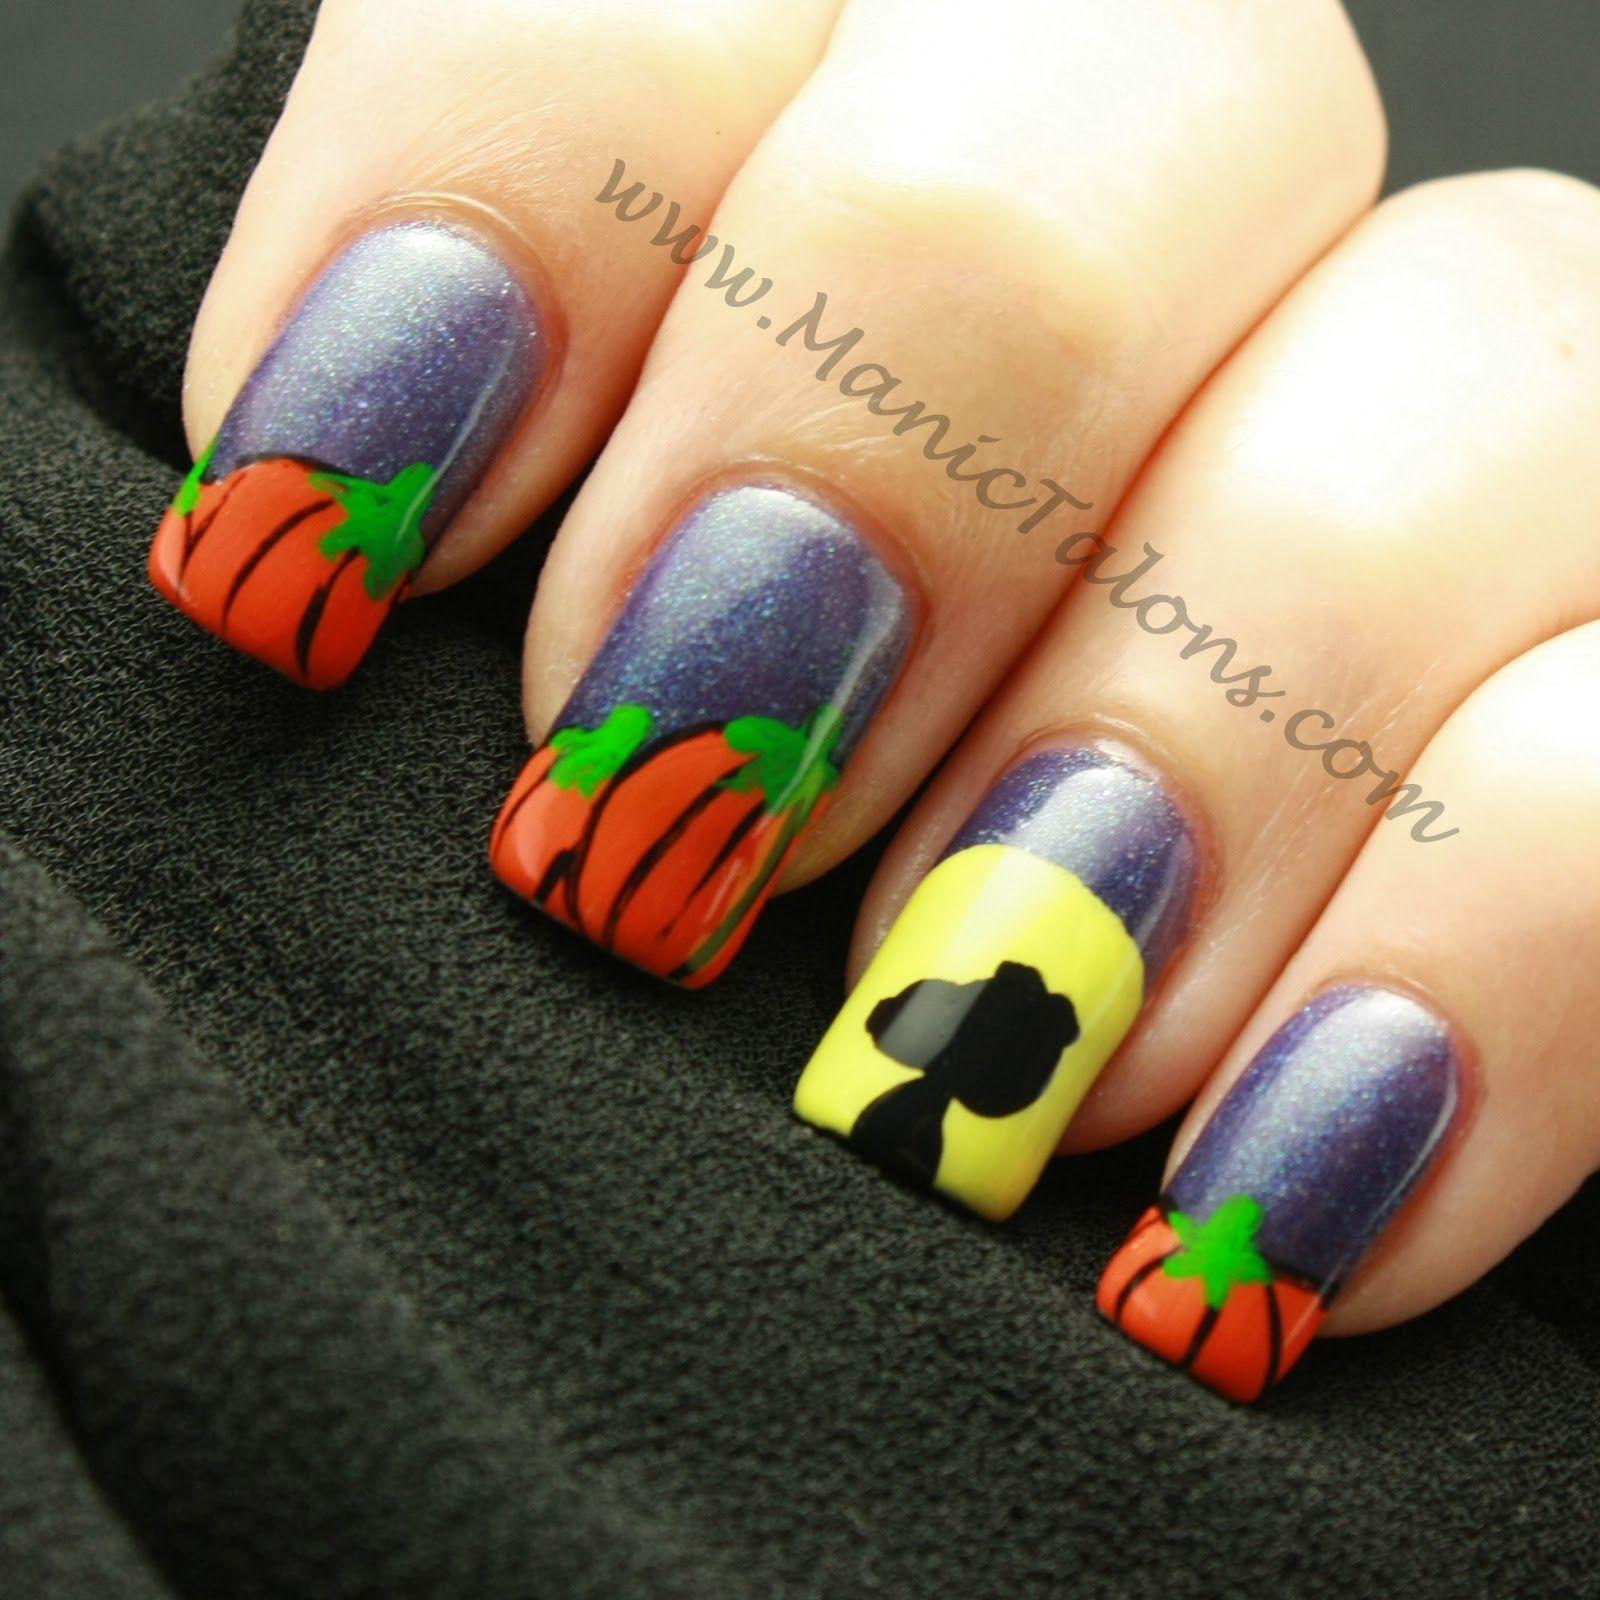 Great Pumpkin Nail Art | Favorite things in general | Pinterest ...